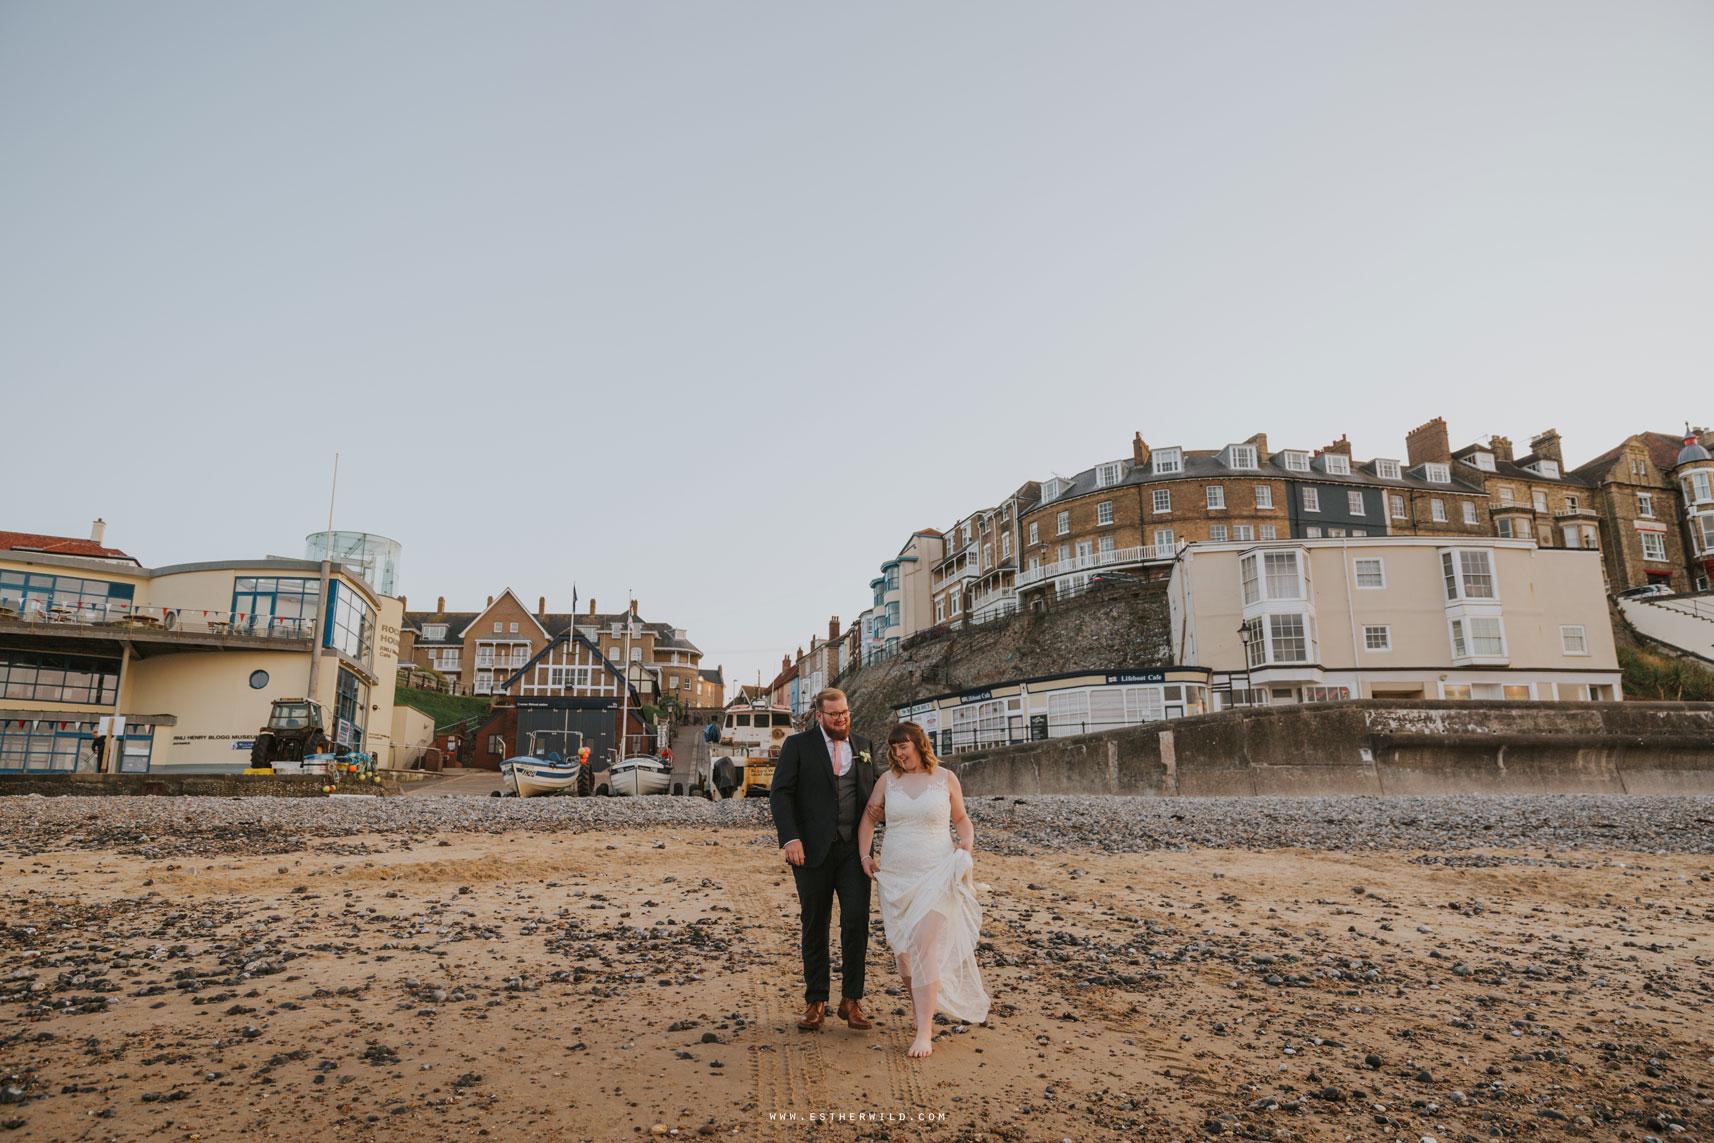 Cromer_Wedding_Beach_Outdoor_Ceremony_Norfolk_North_Lodge_Registry_Office_Rocket_House_Cafe_Cromer_Pier_IMG_4974_IMGL8500.jpg